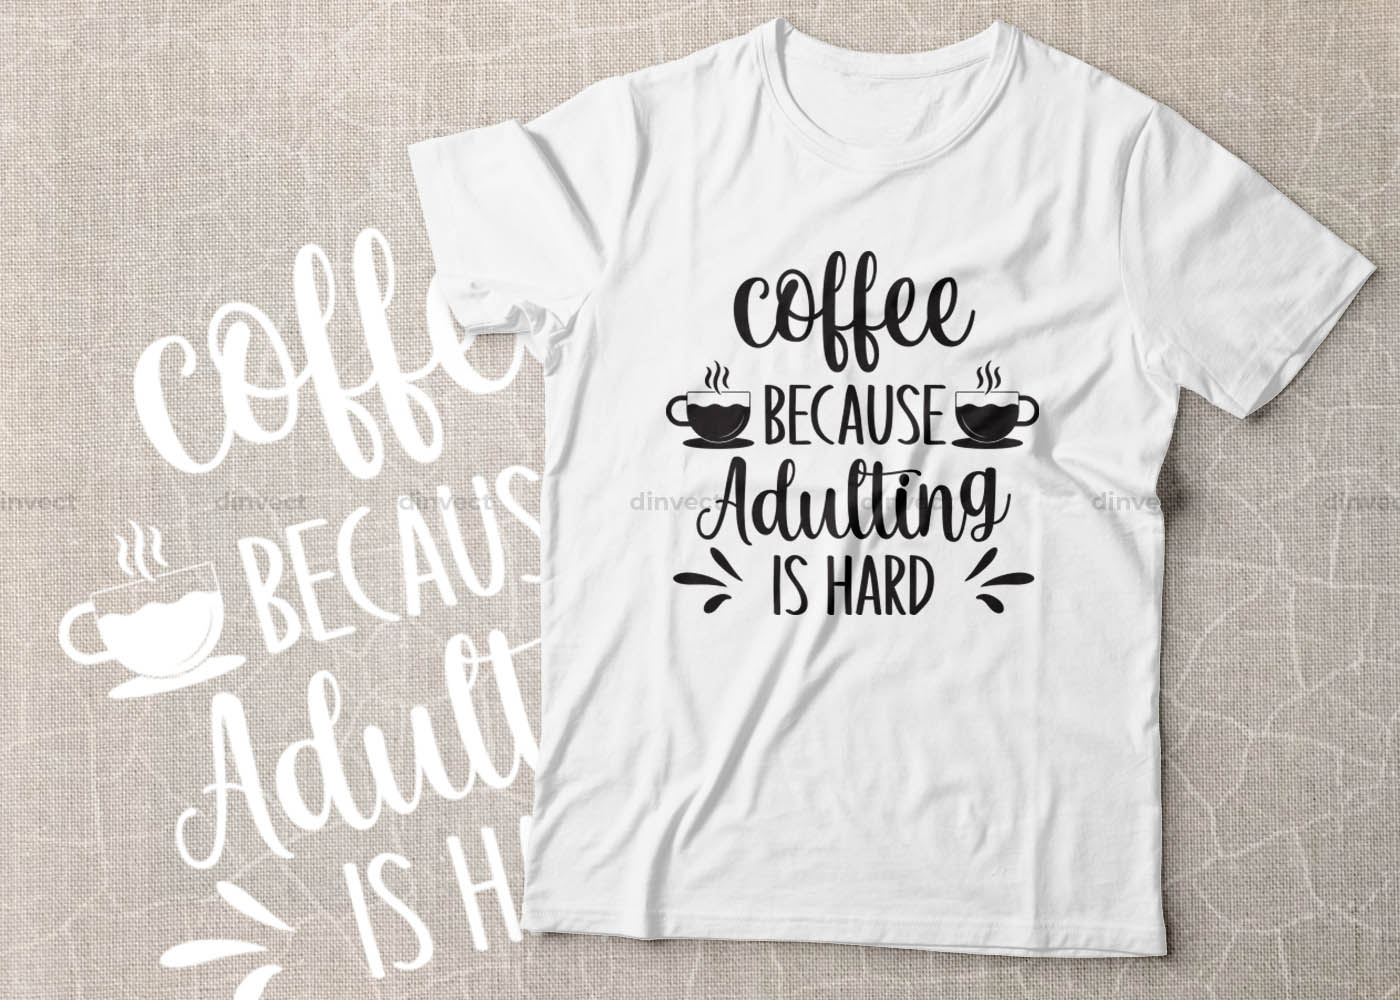 Coffee SVG, Coffee Bundle Svg, Coffee Mug Svg, Funny Coffee Quotes SVG, Mug Design Svg, Coffee Quote - Coffee 1 1 -